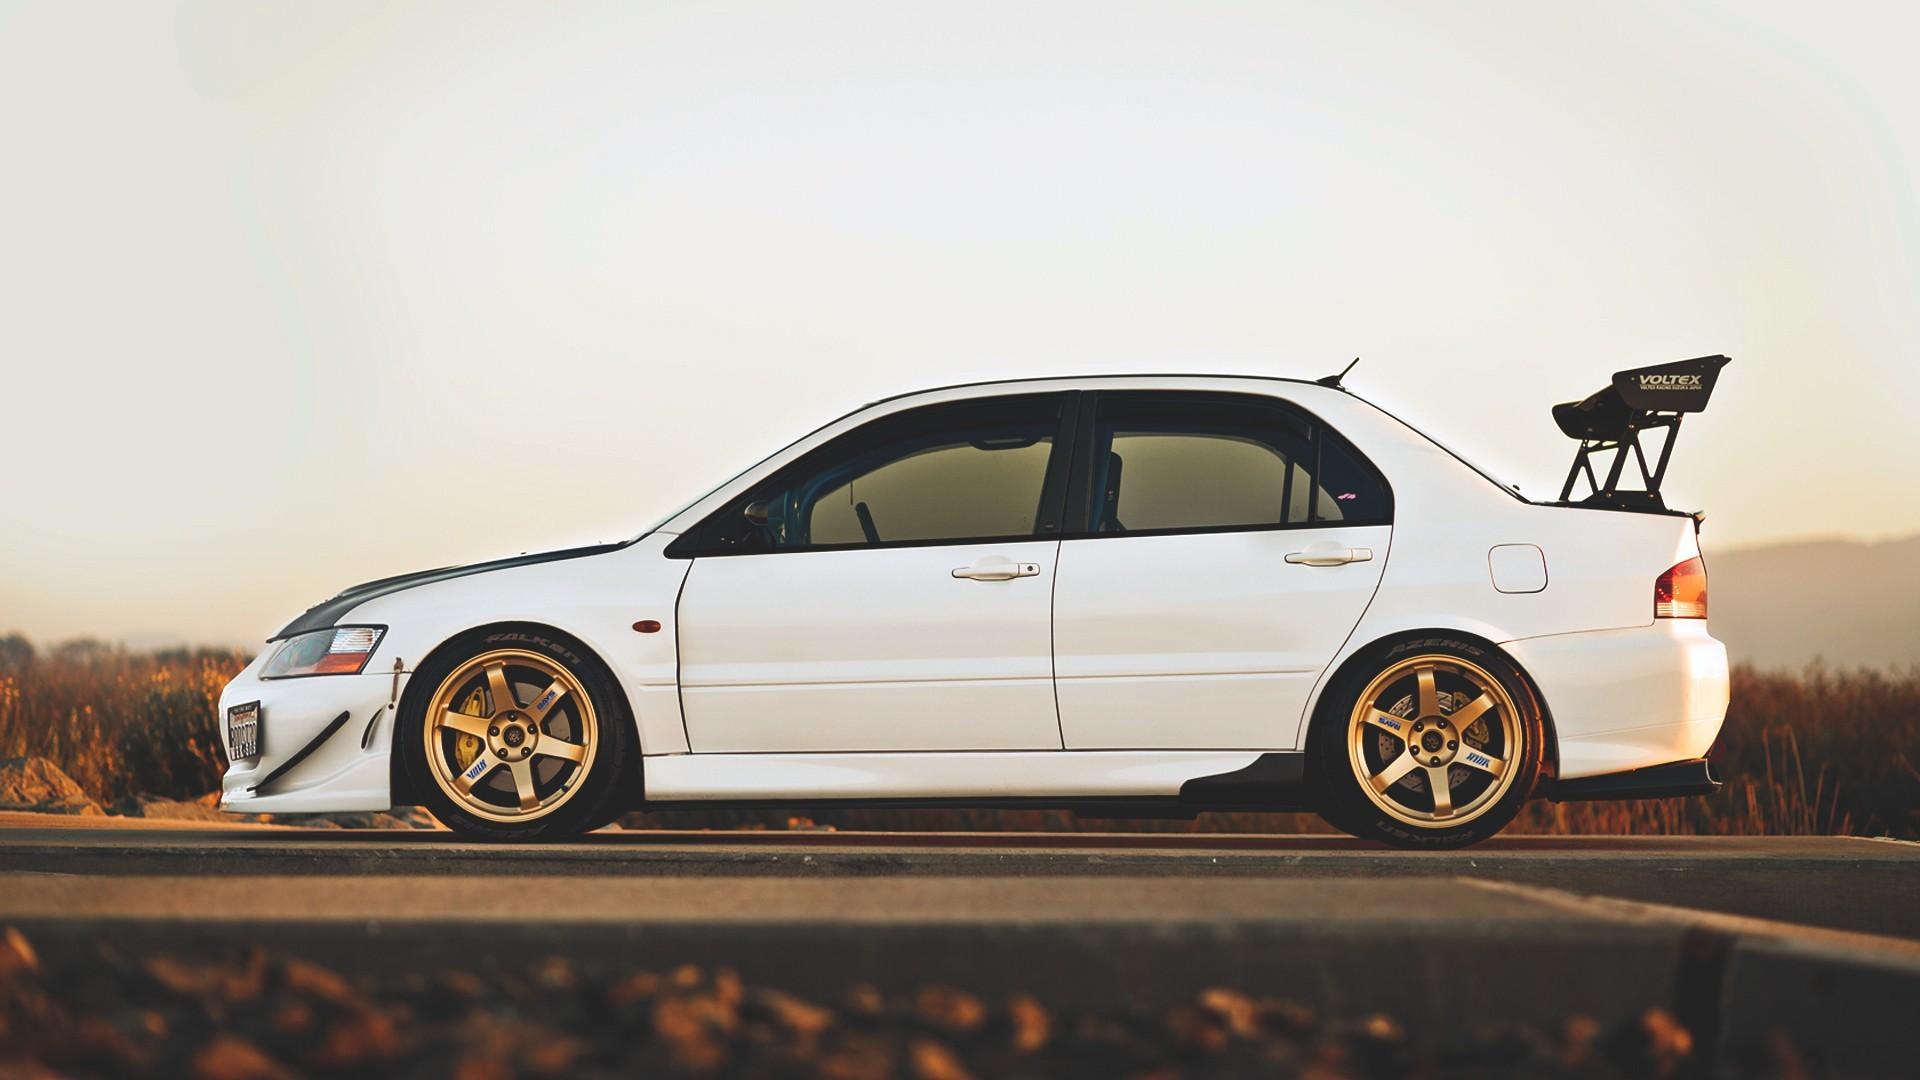 Res: 1920x1080, #tuning, #white cars, #vehicle, #Mitsubishi Lancer EVO, #evolution, #car,  wallpaper